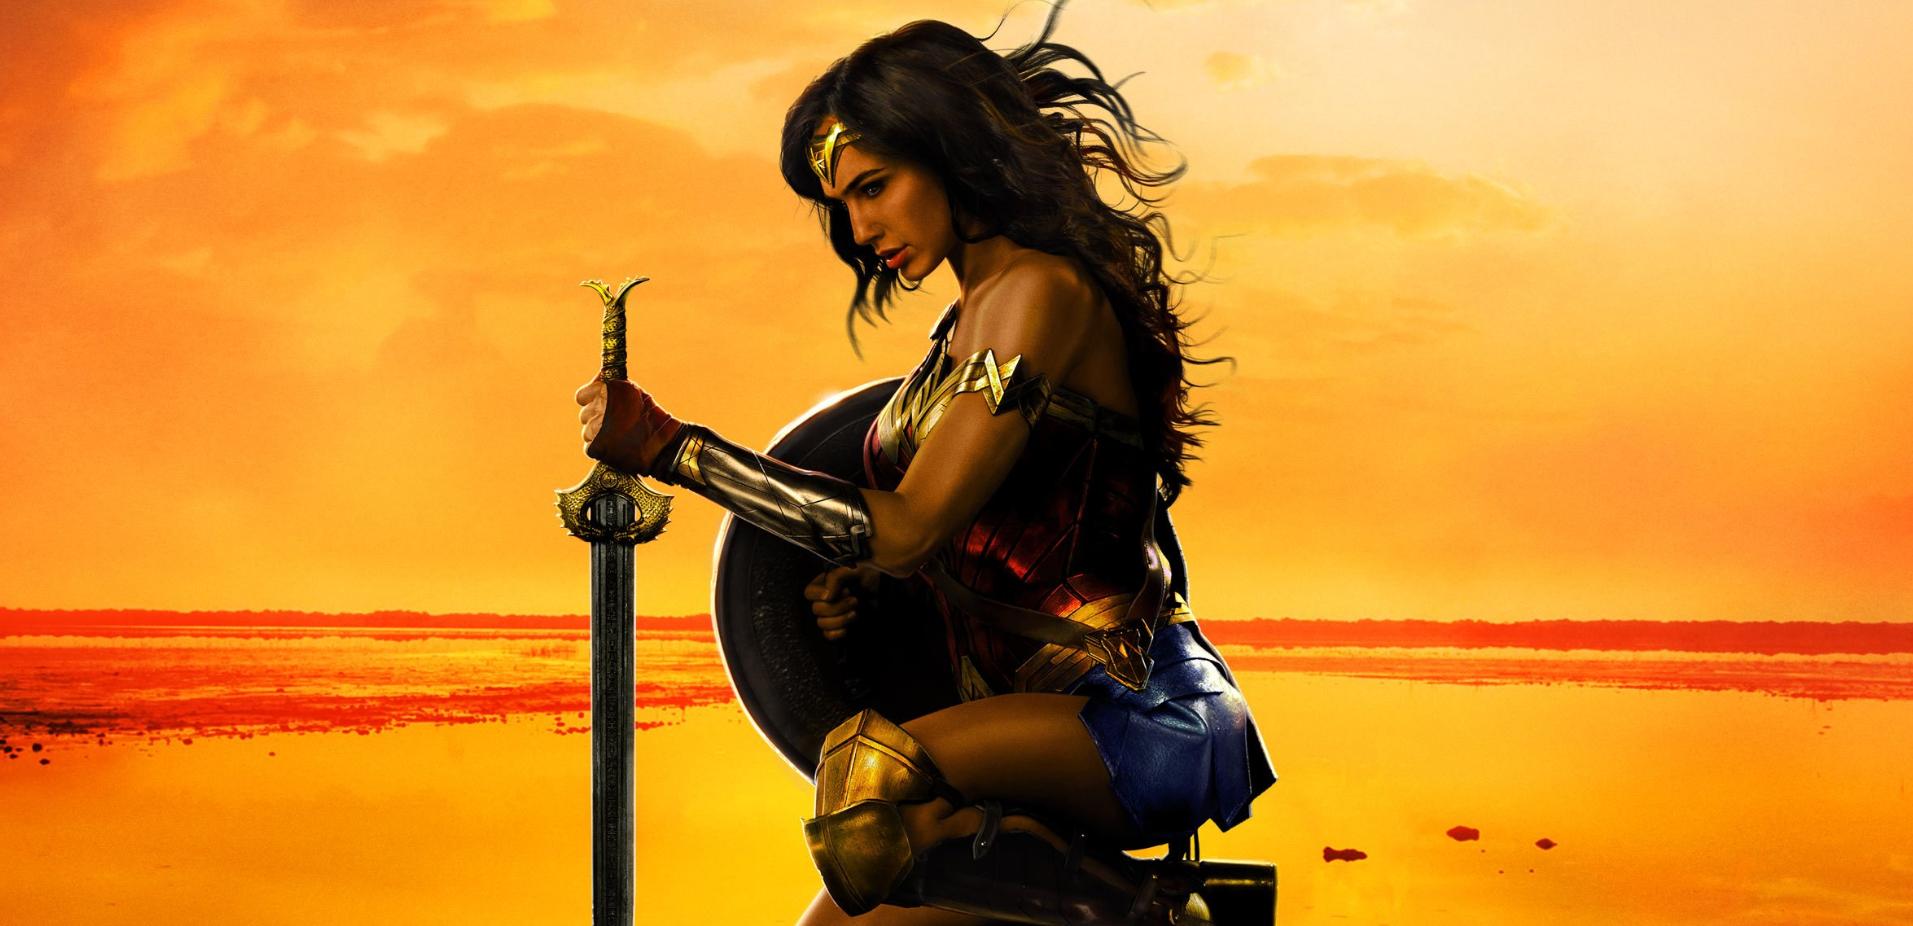 Wallpaper Gal Gadot As Wonder Woman 2017 Hd Picture Image: Wonder Woman Wallpaper And Background Image